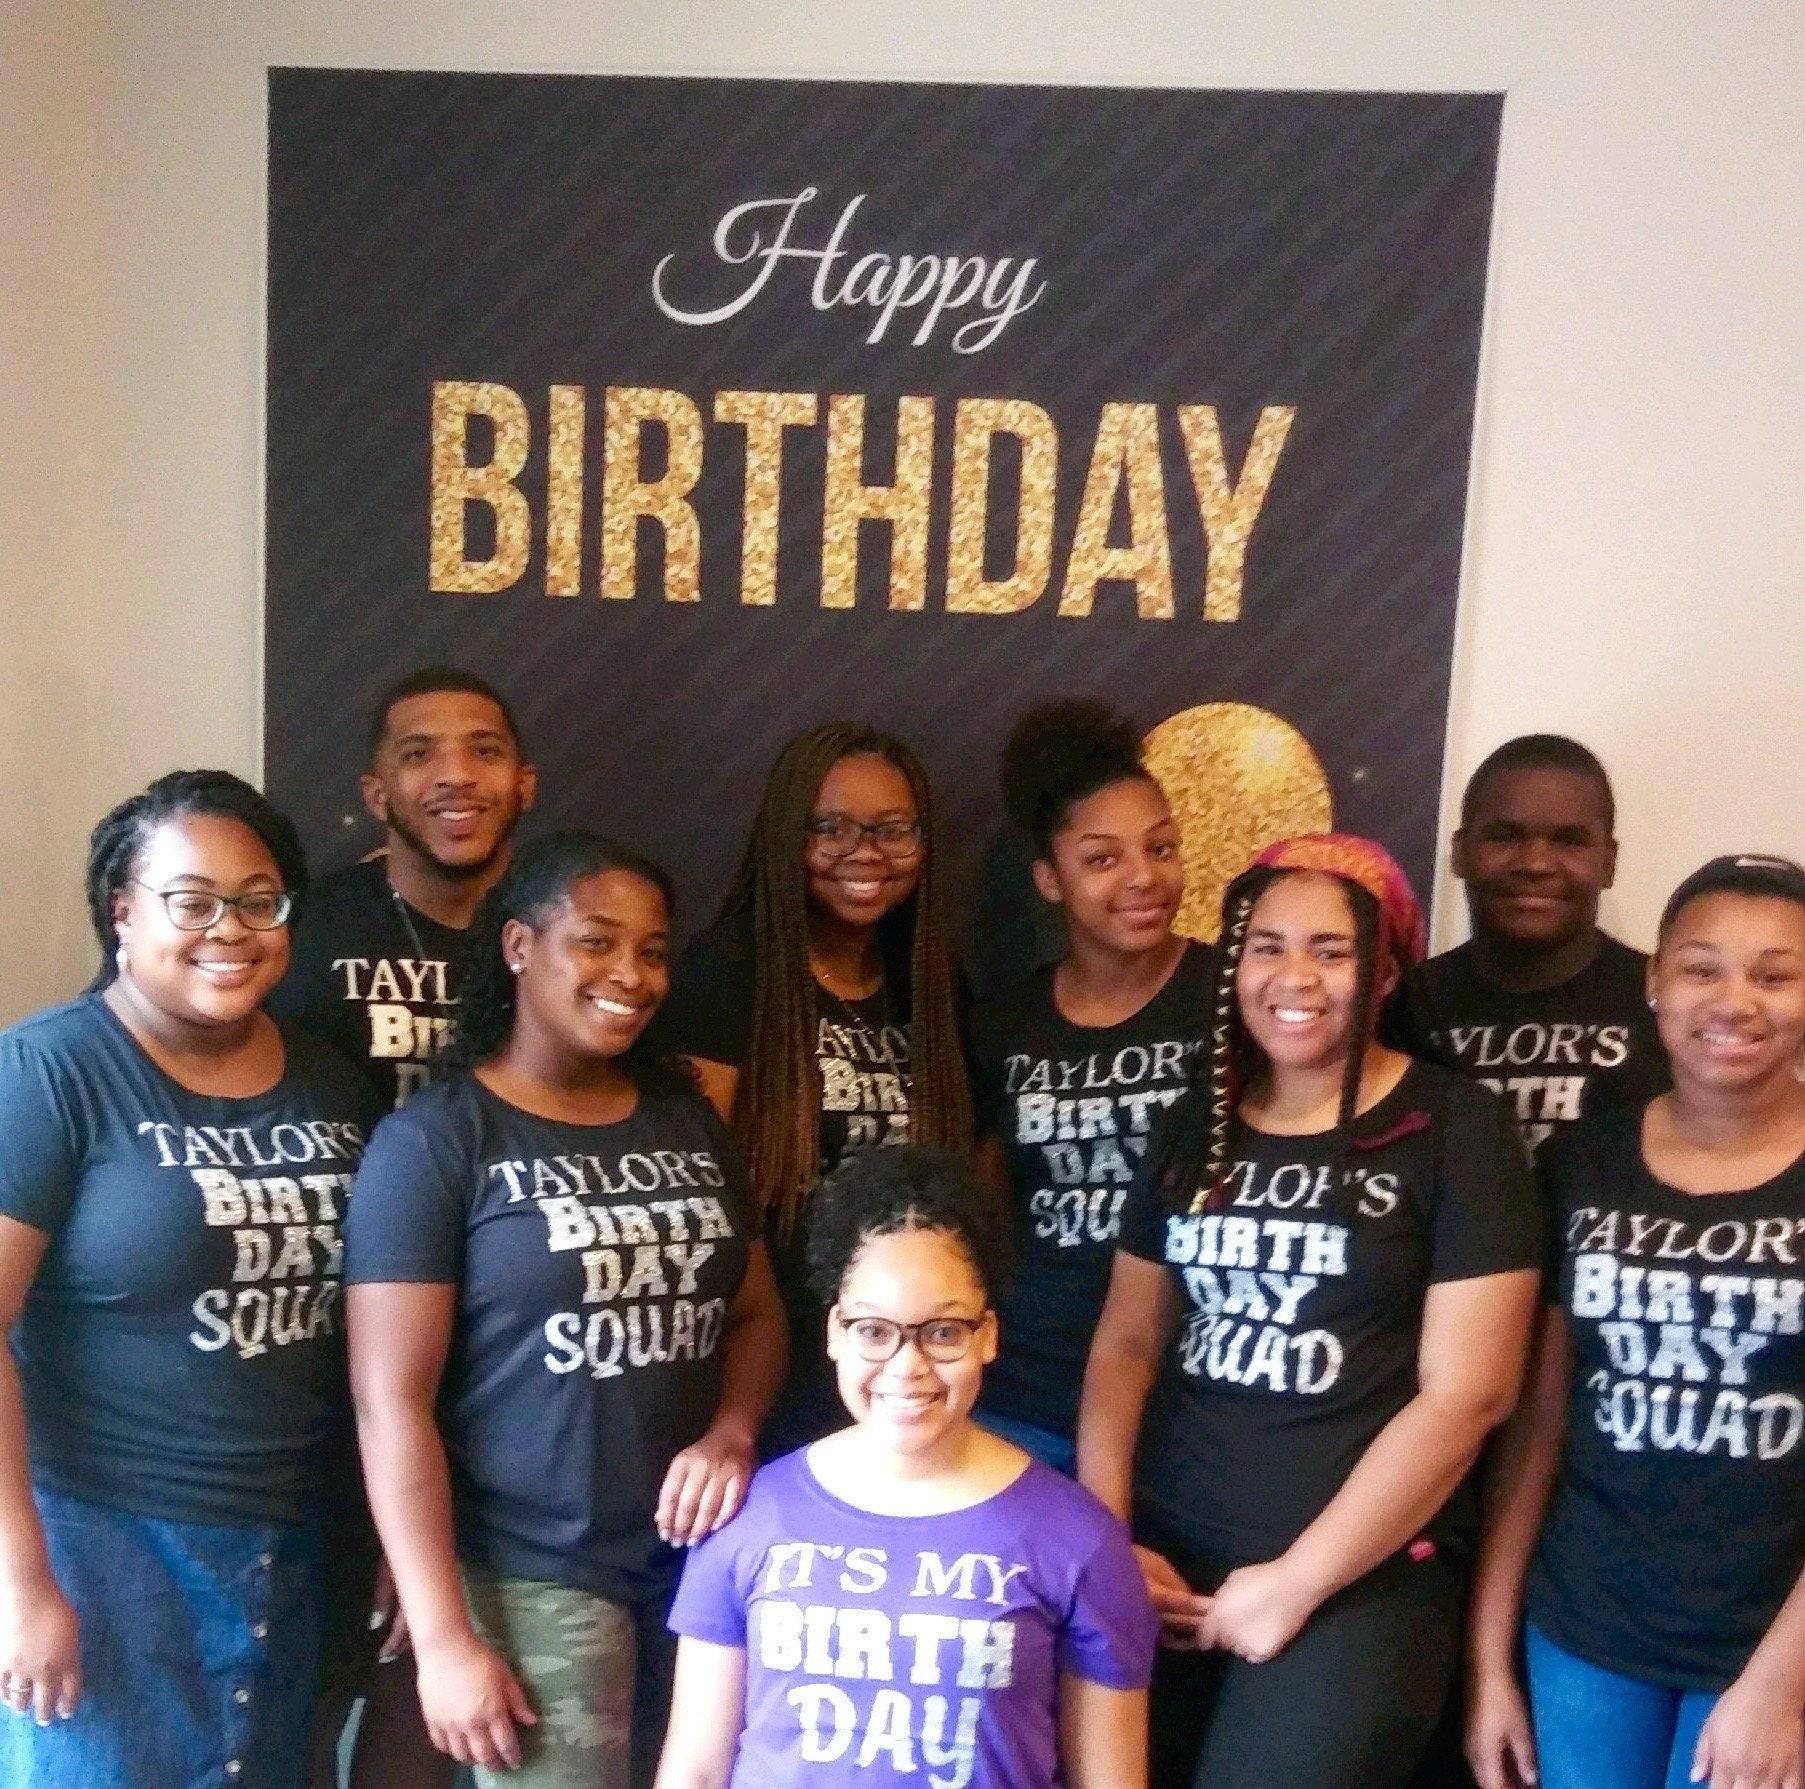 CUSTOM Birthday Squad Shirt Ladies Personalized Shirts Flowy Adult Glitter